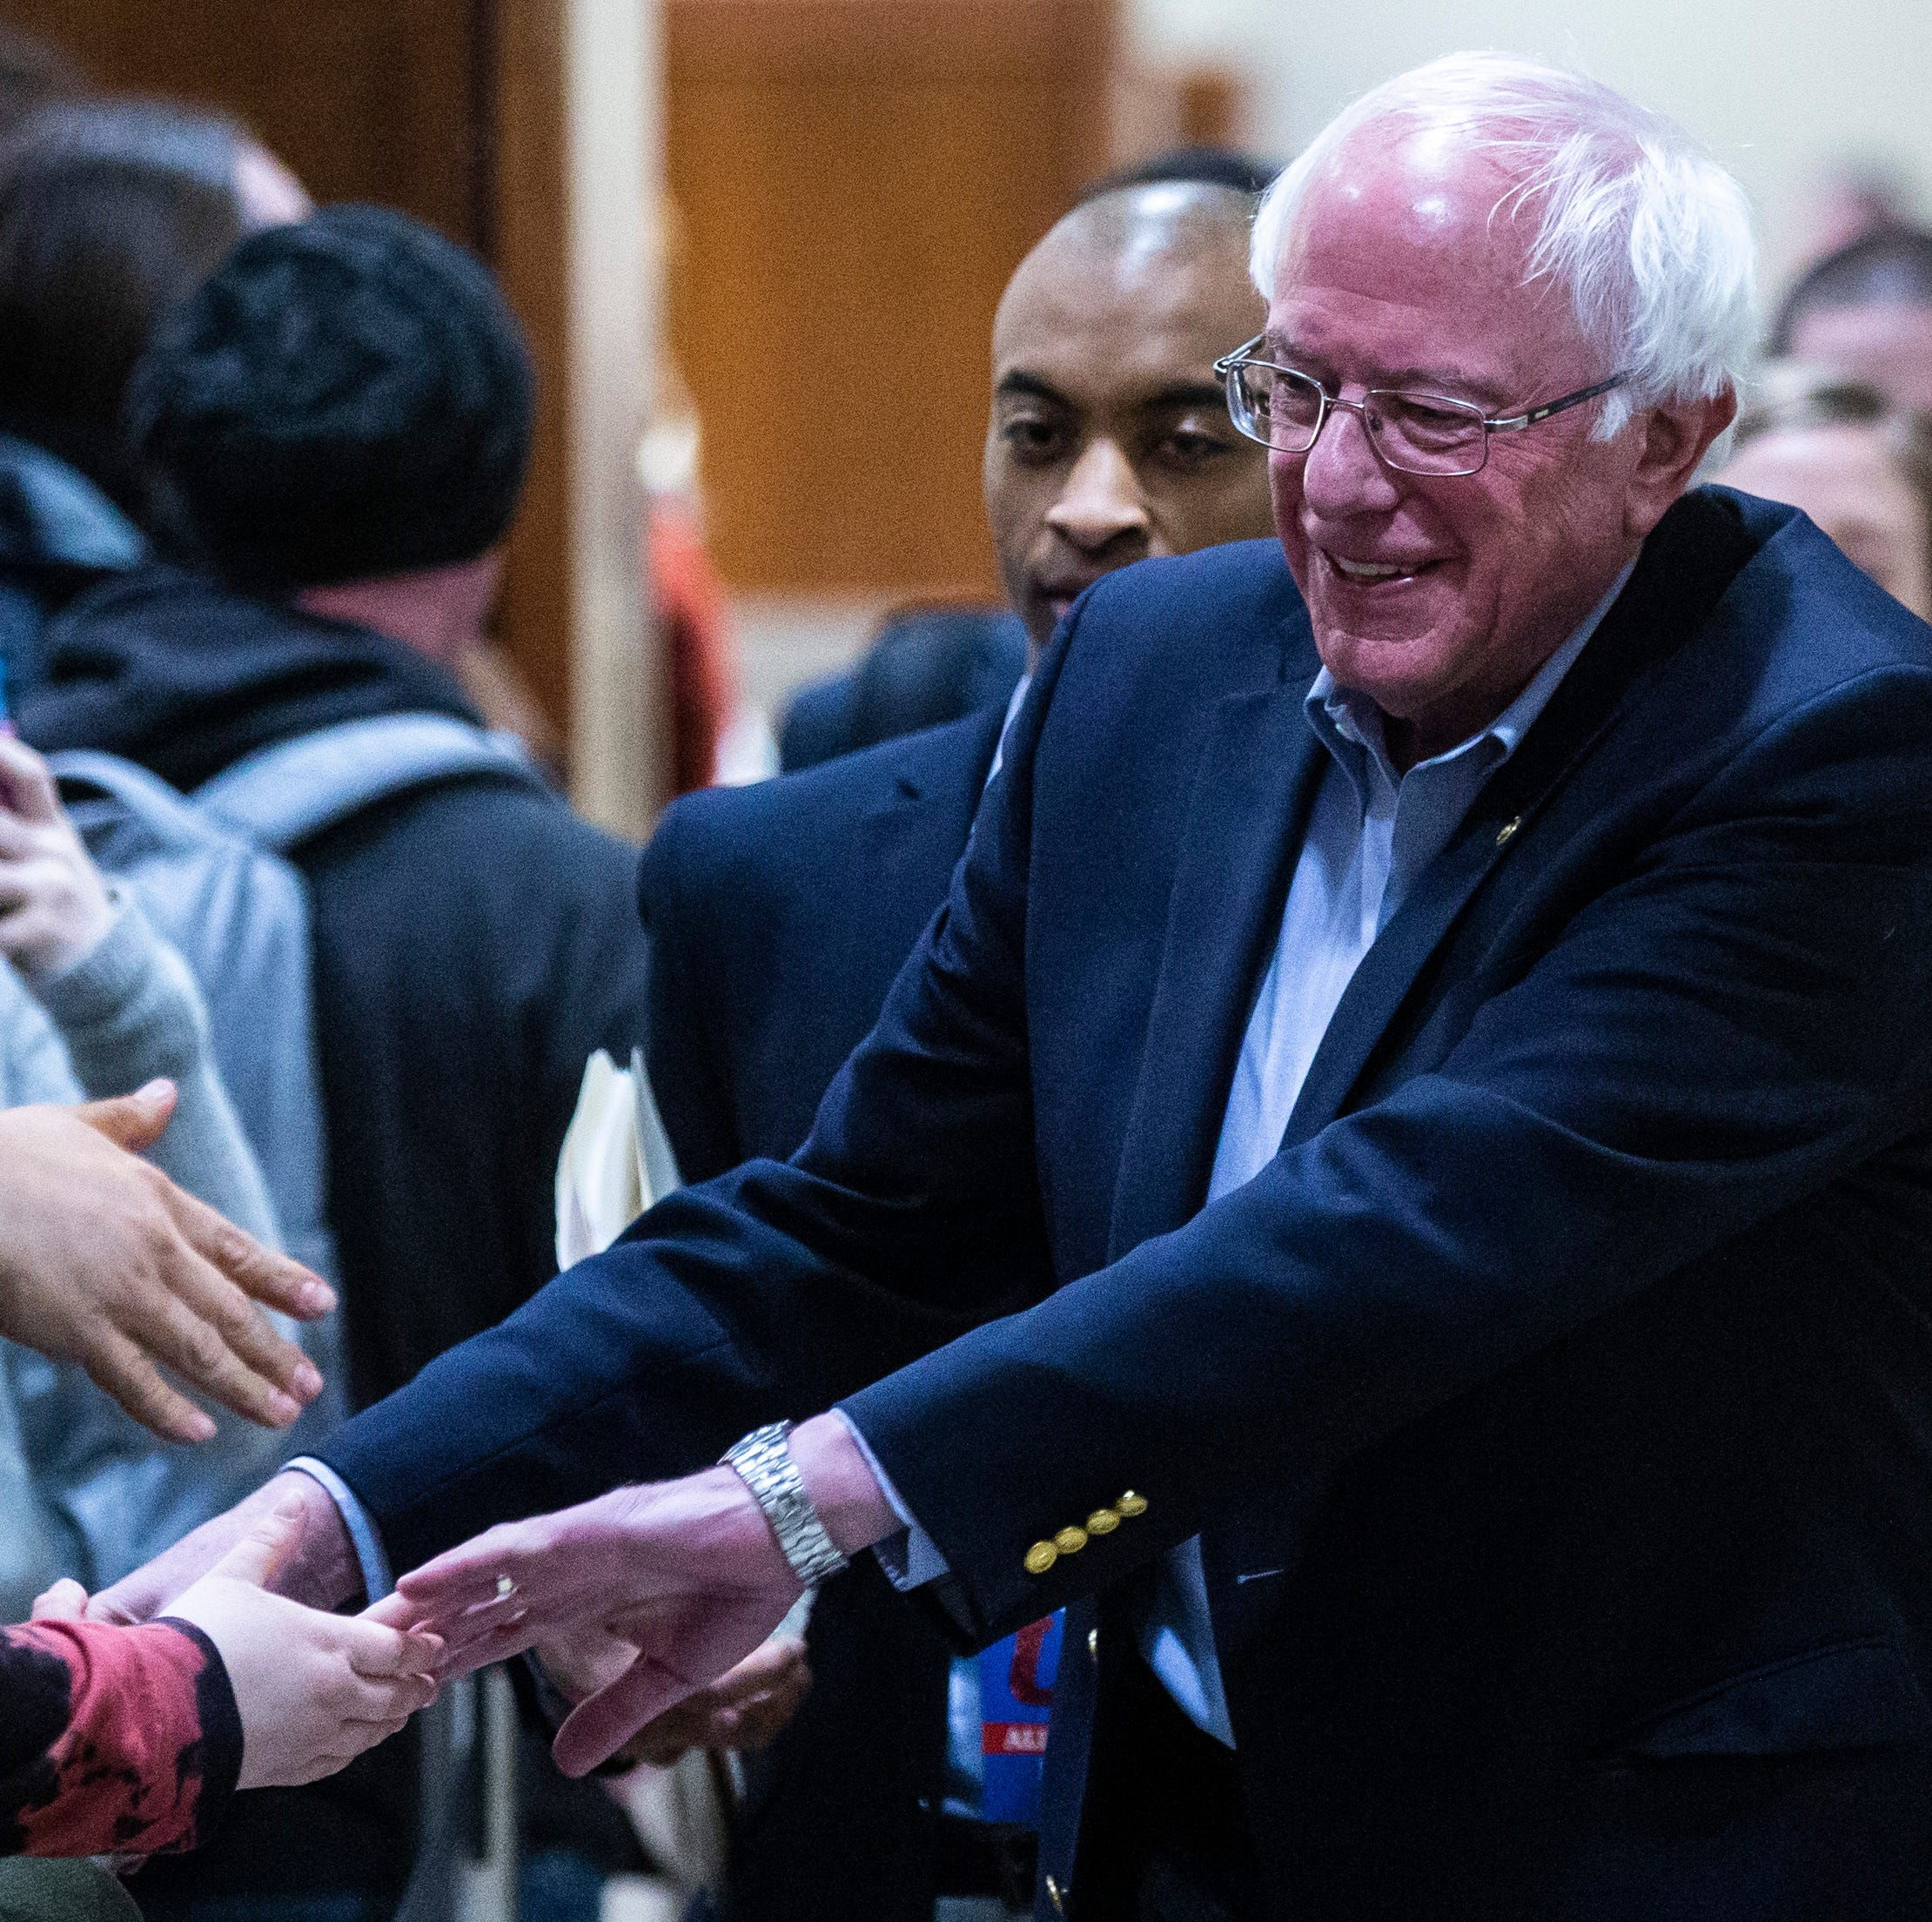 Bernie Sanders comes to the University of Iowa to rekindle 2016 burn